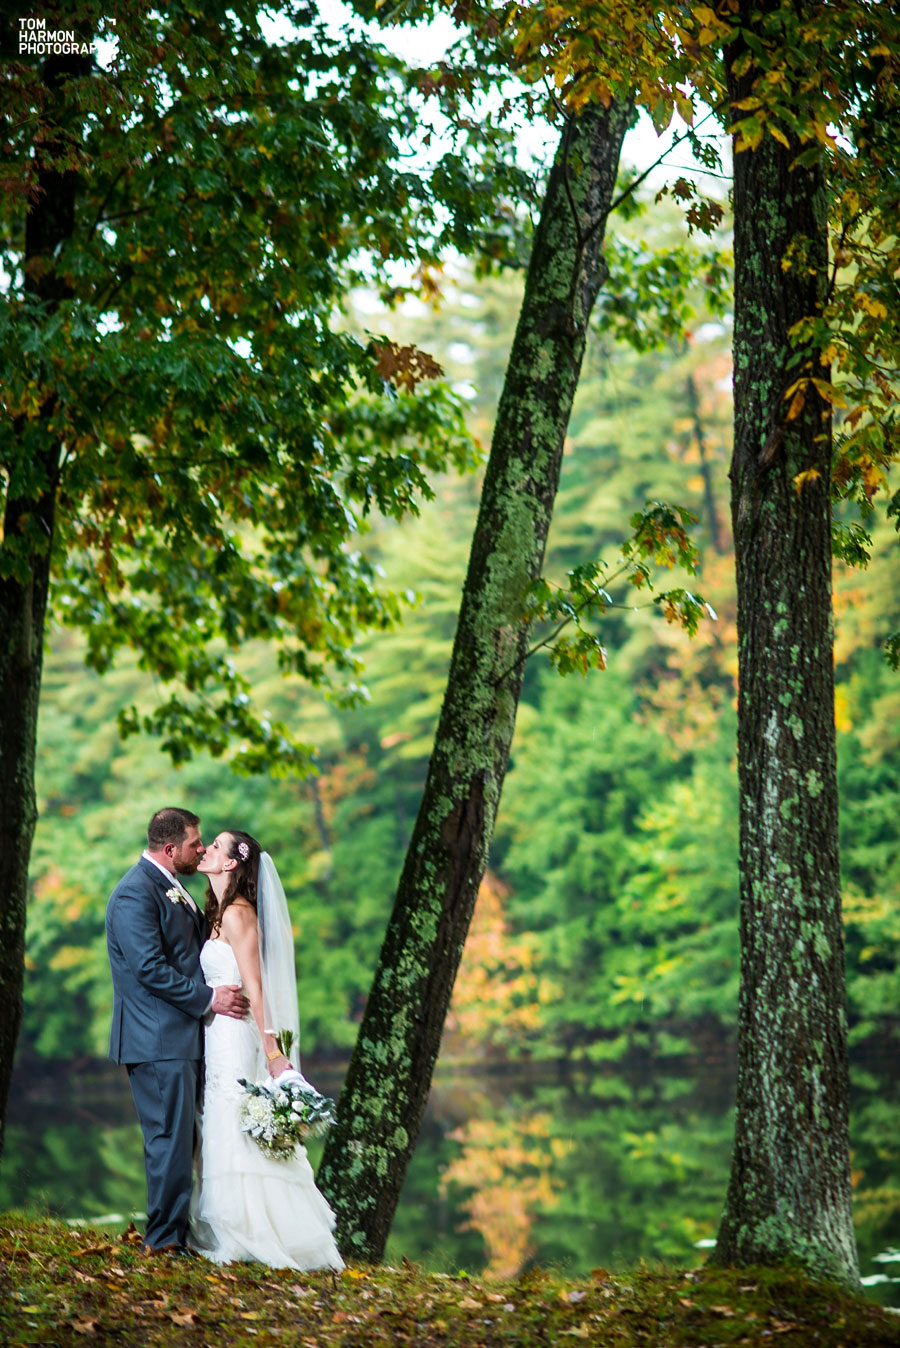 Twin_Lakes_Restort_Wedding_0019